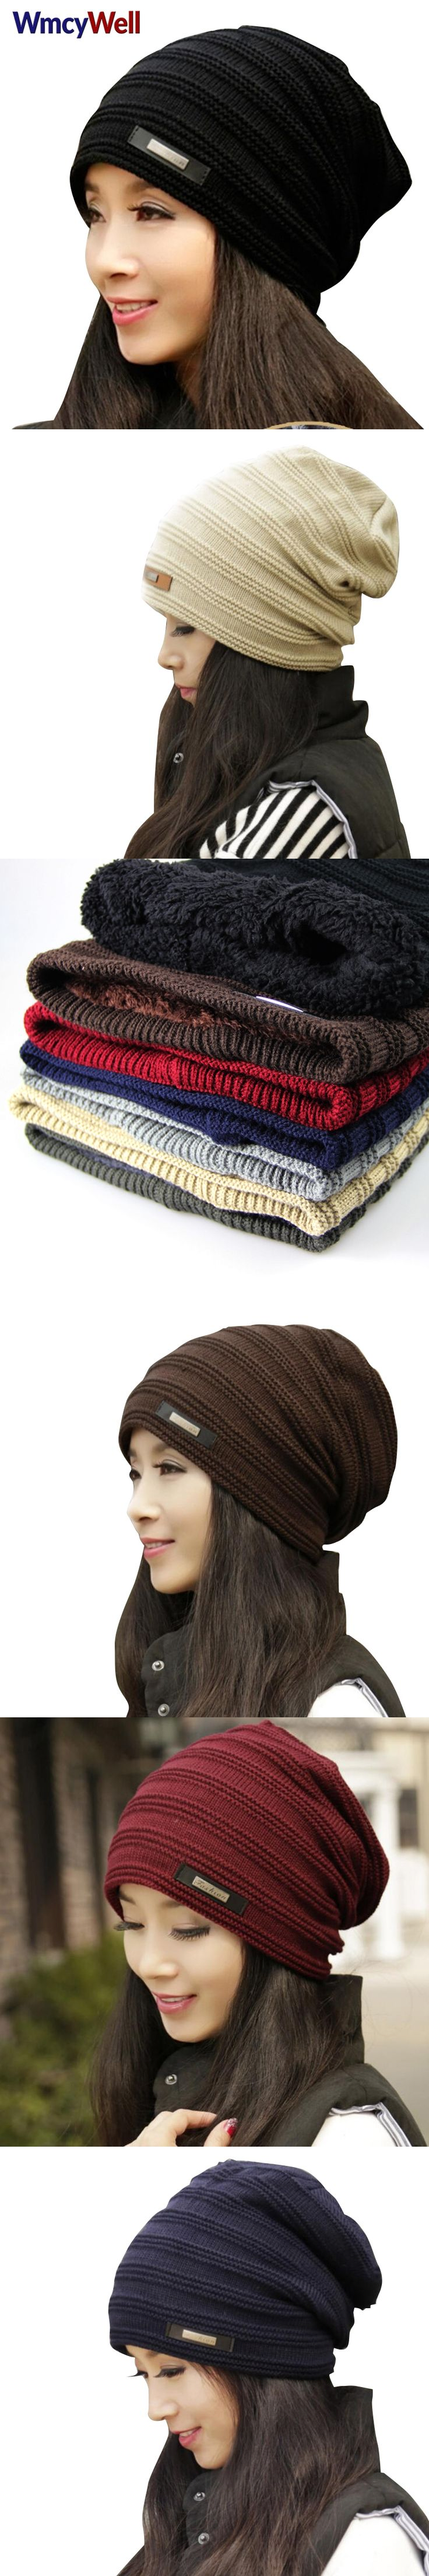 WmcyWell 2017 Beanies Knit Winter Hats For Men Women Beanie Men's Winter Hat Caps Bonnet Outdoor Ski Sports Warm Baggy Cap